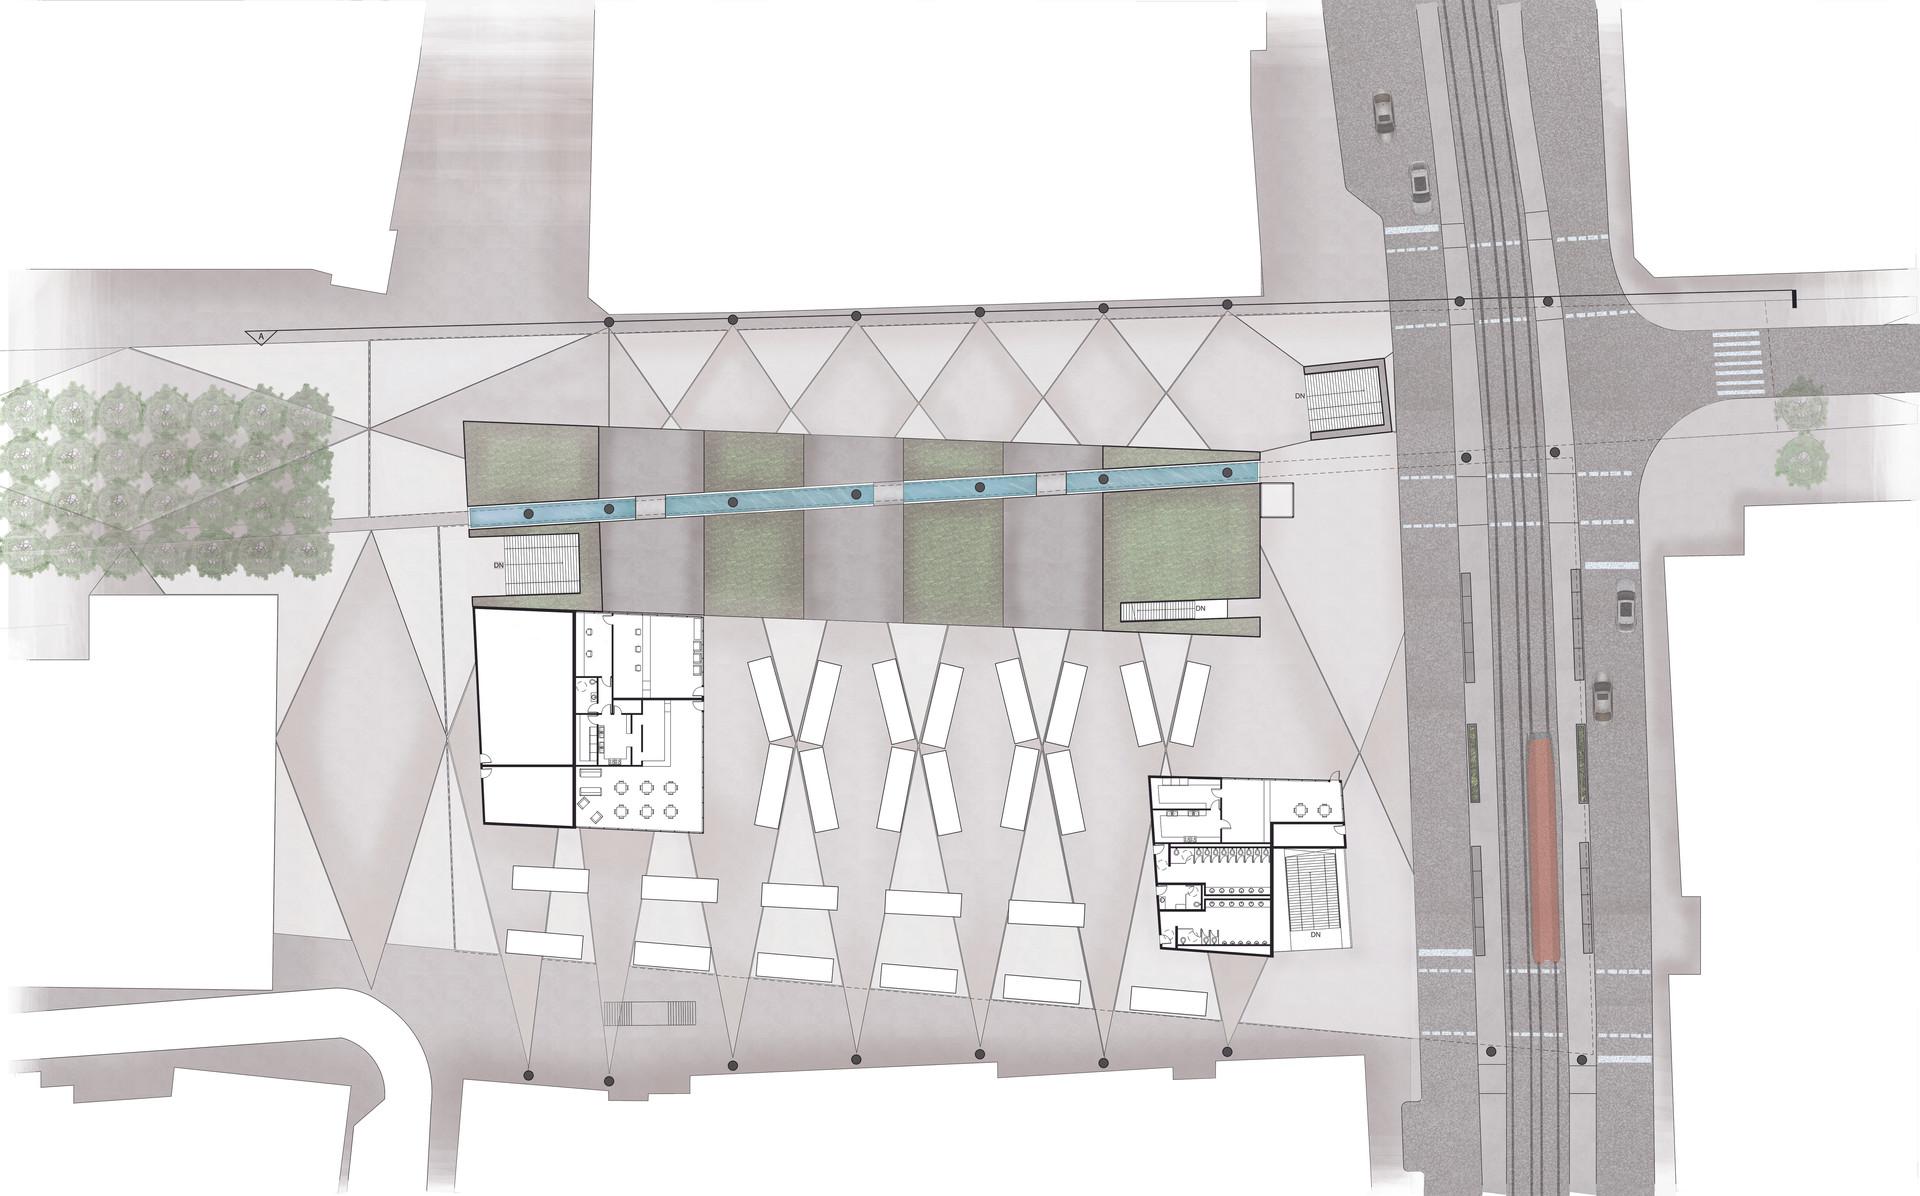 pavement plan 2.jpg